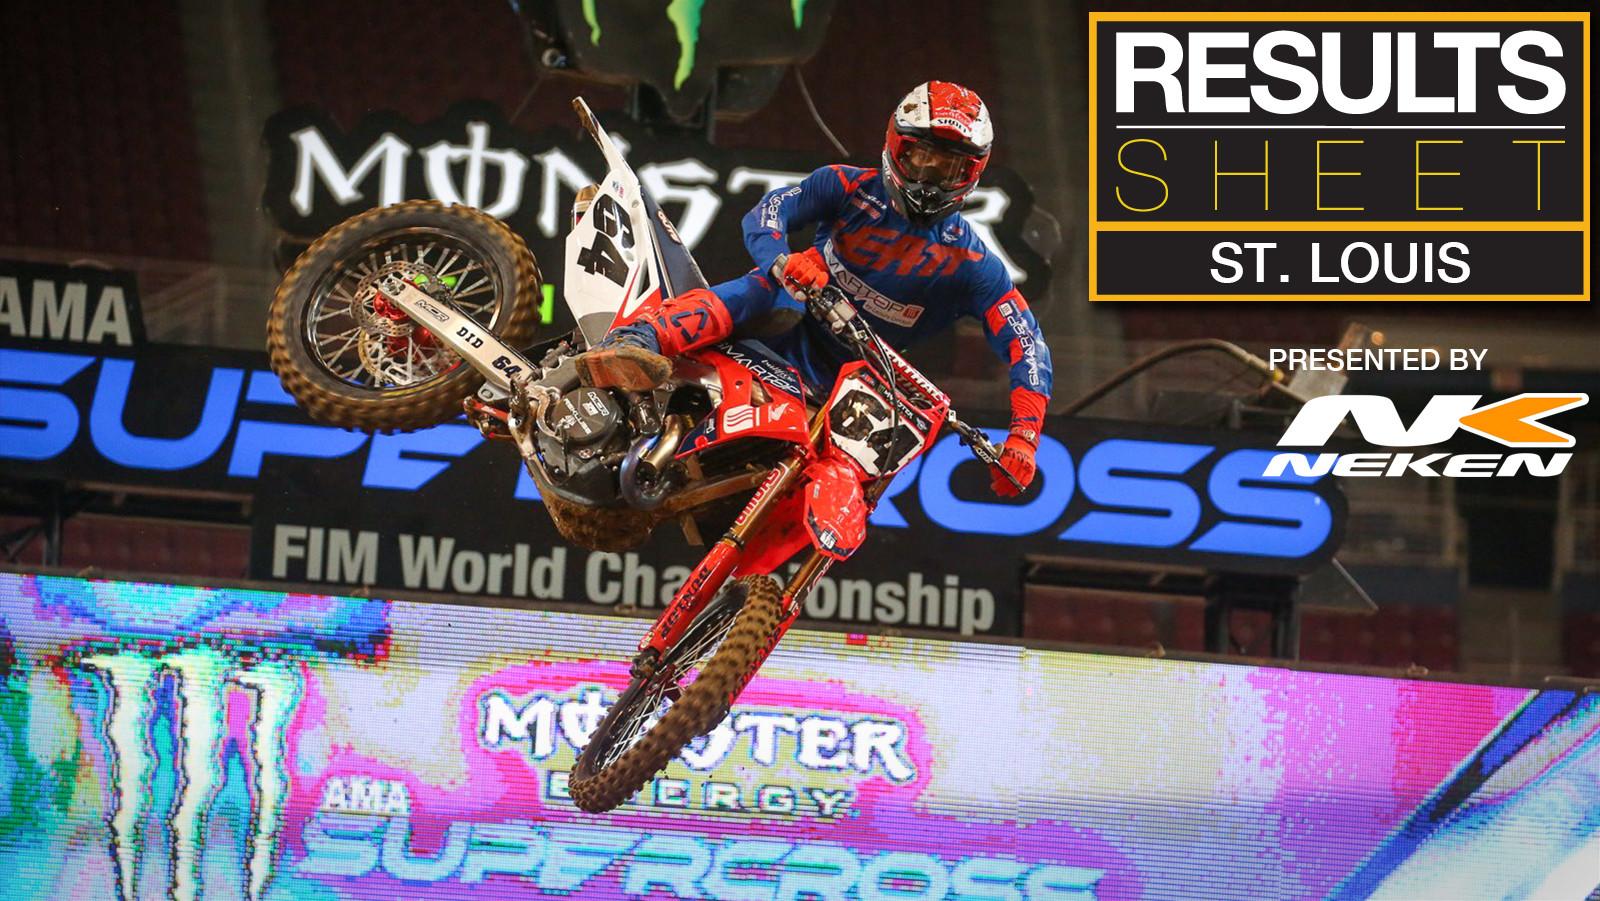 Results Sheet: 2020 St. Louis Supercross